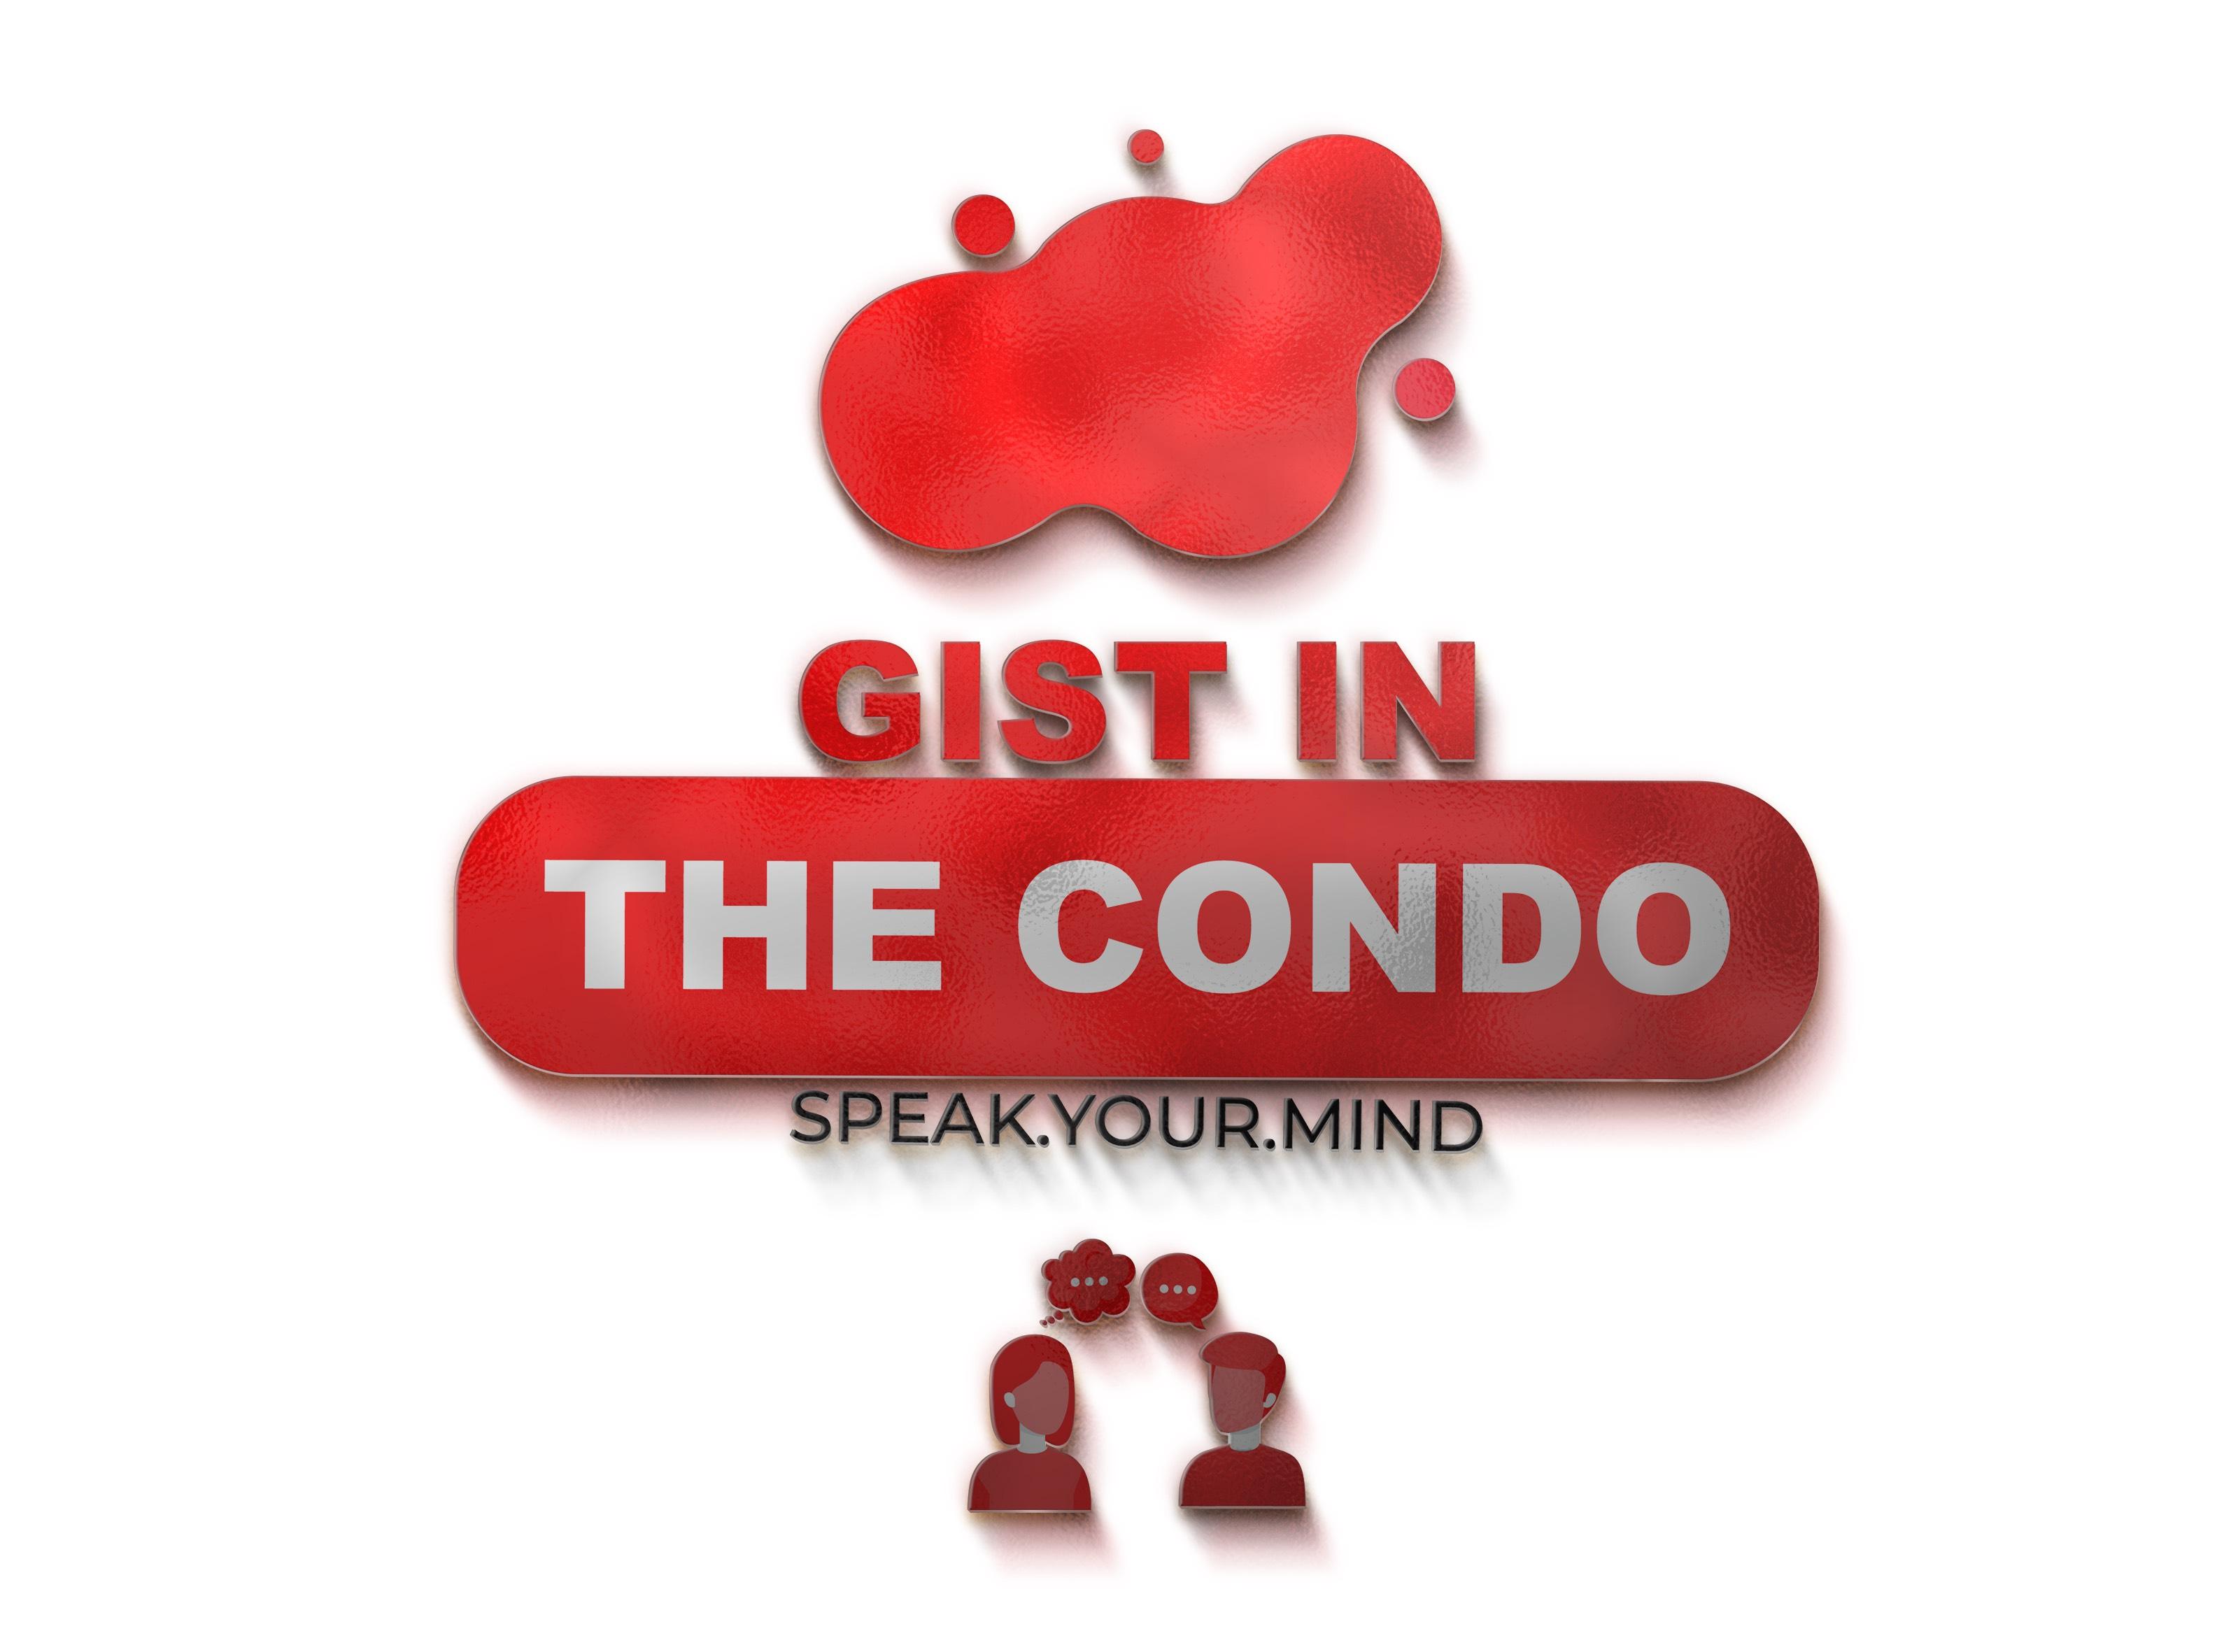 GistInTheCondo Introduces Creative Video and Talk Show Platform